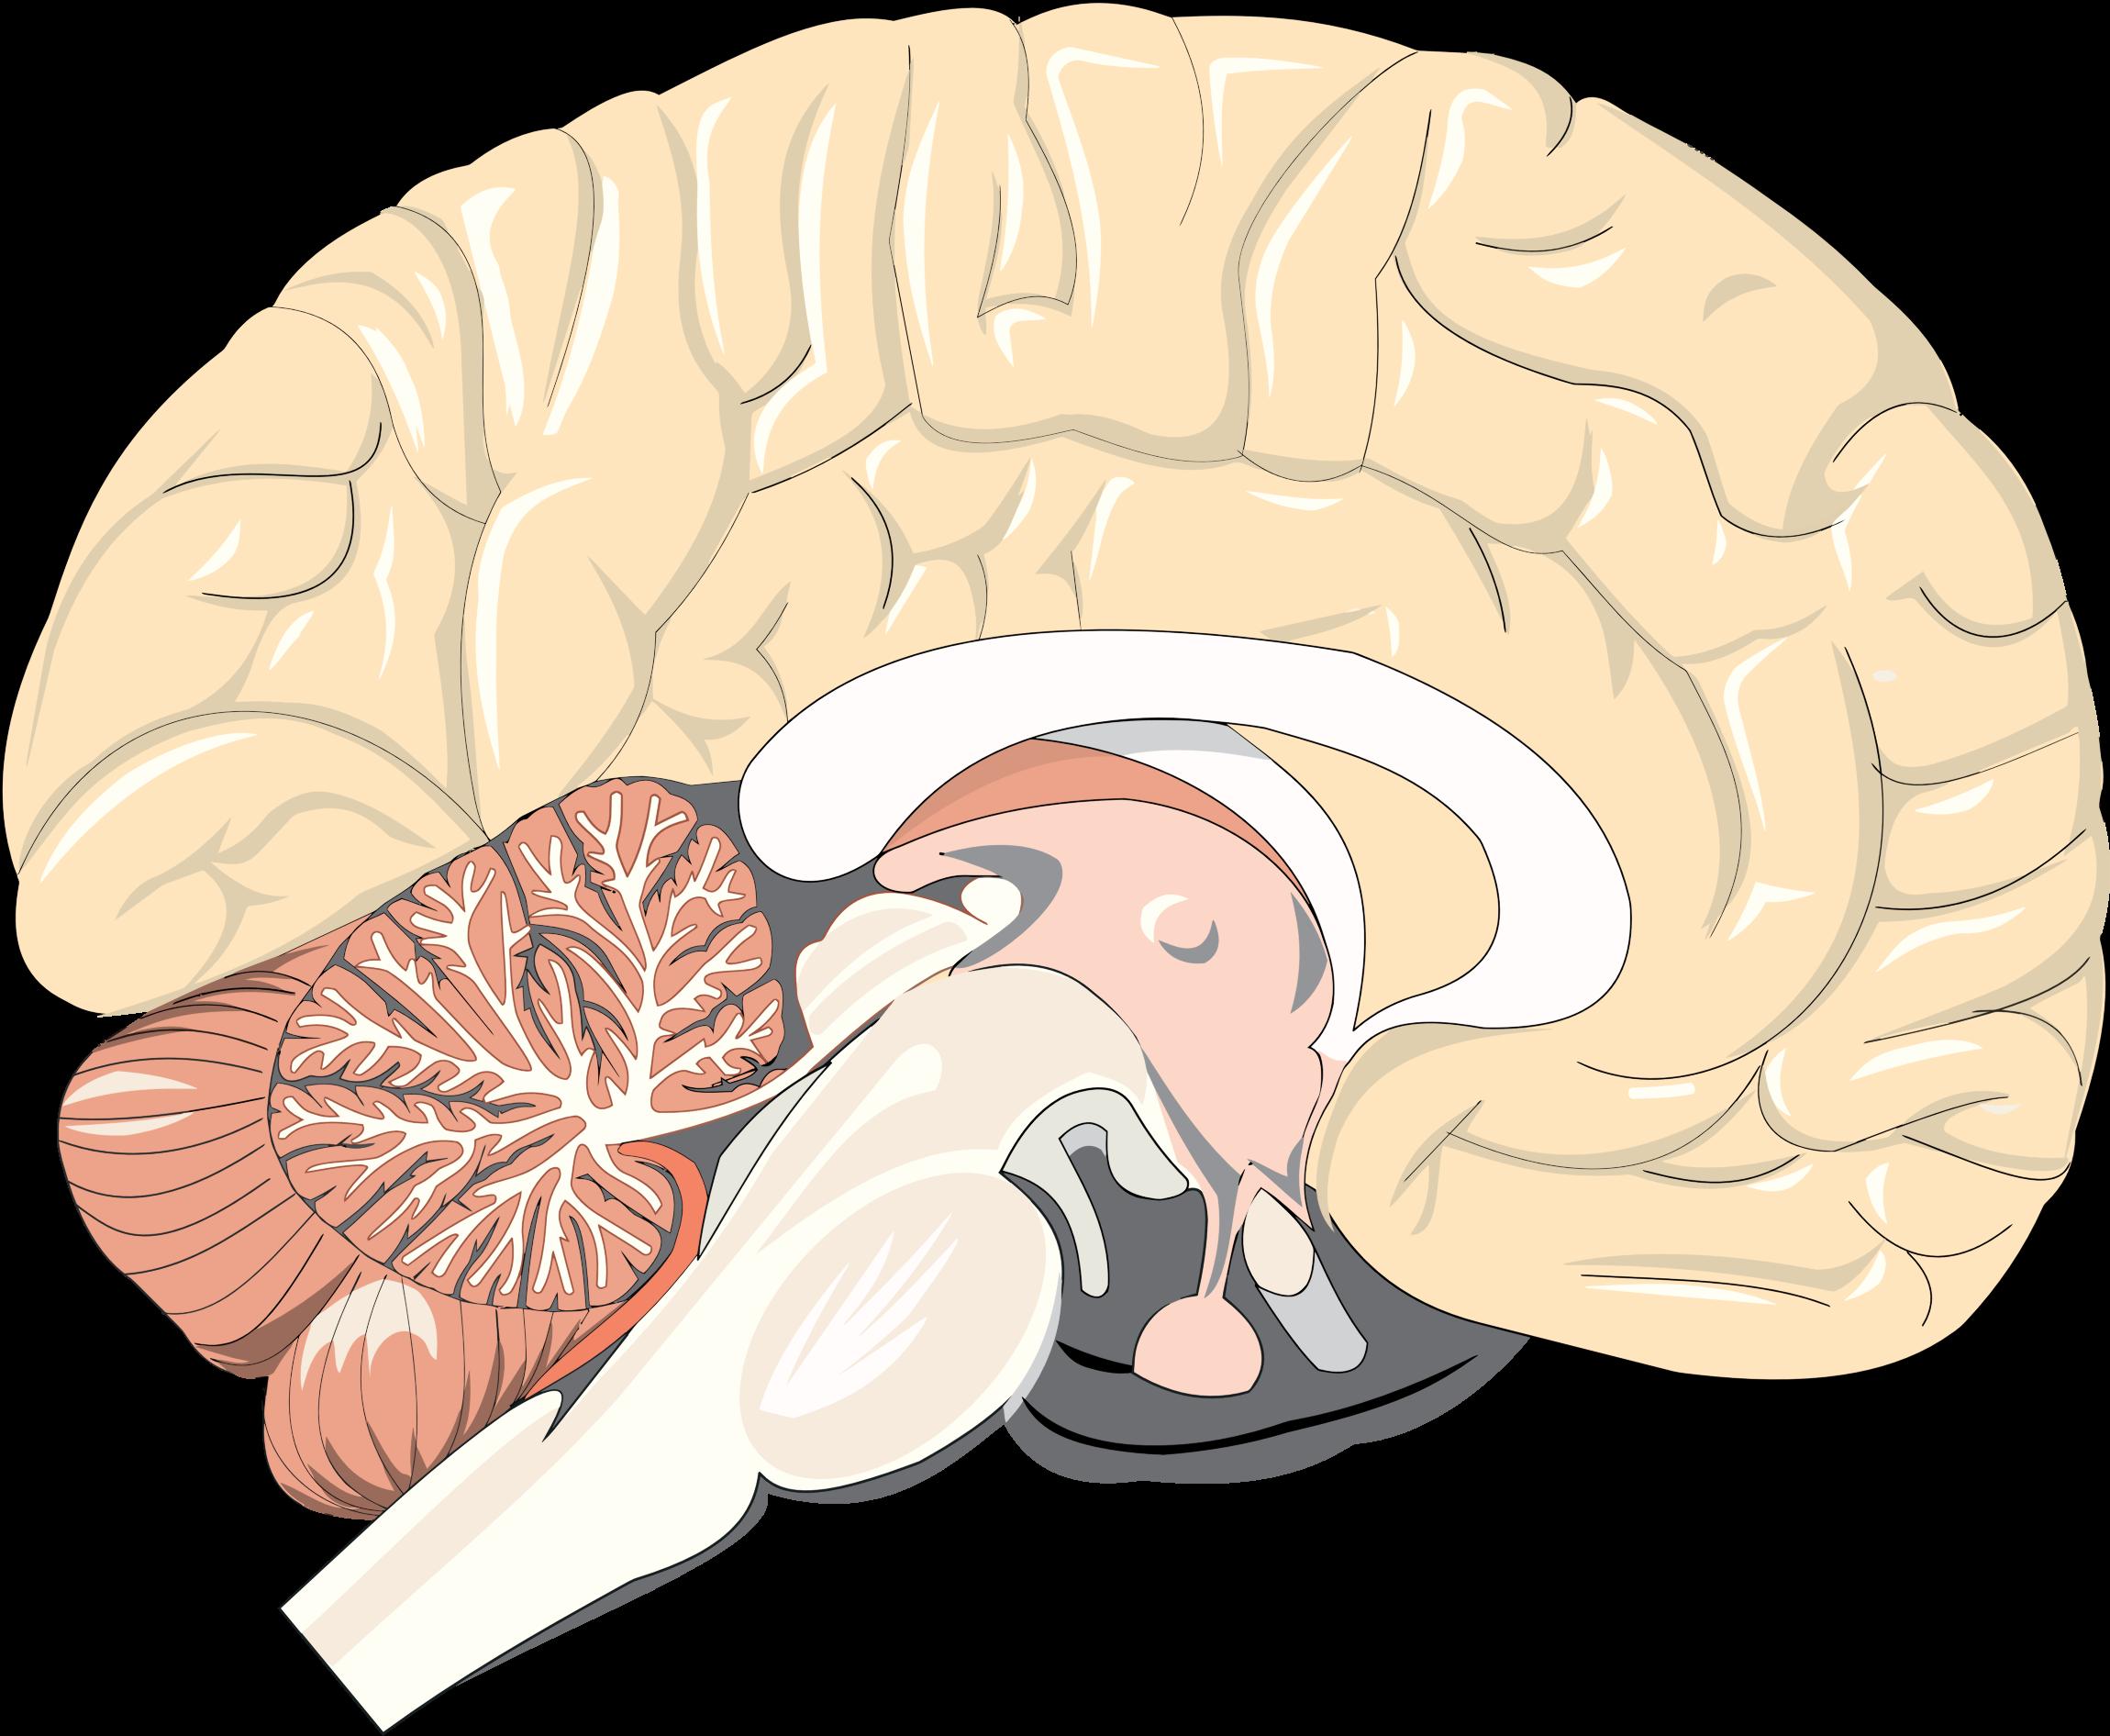 Realistic clipart human brain #14